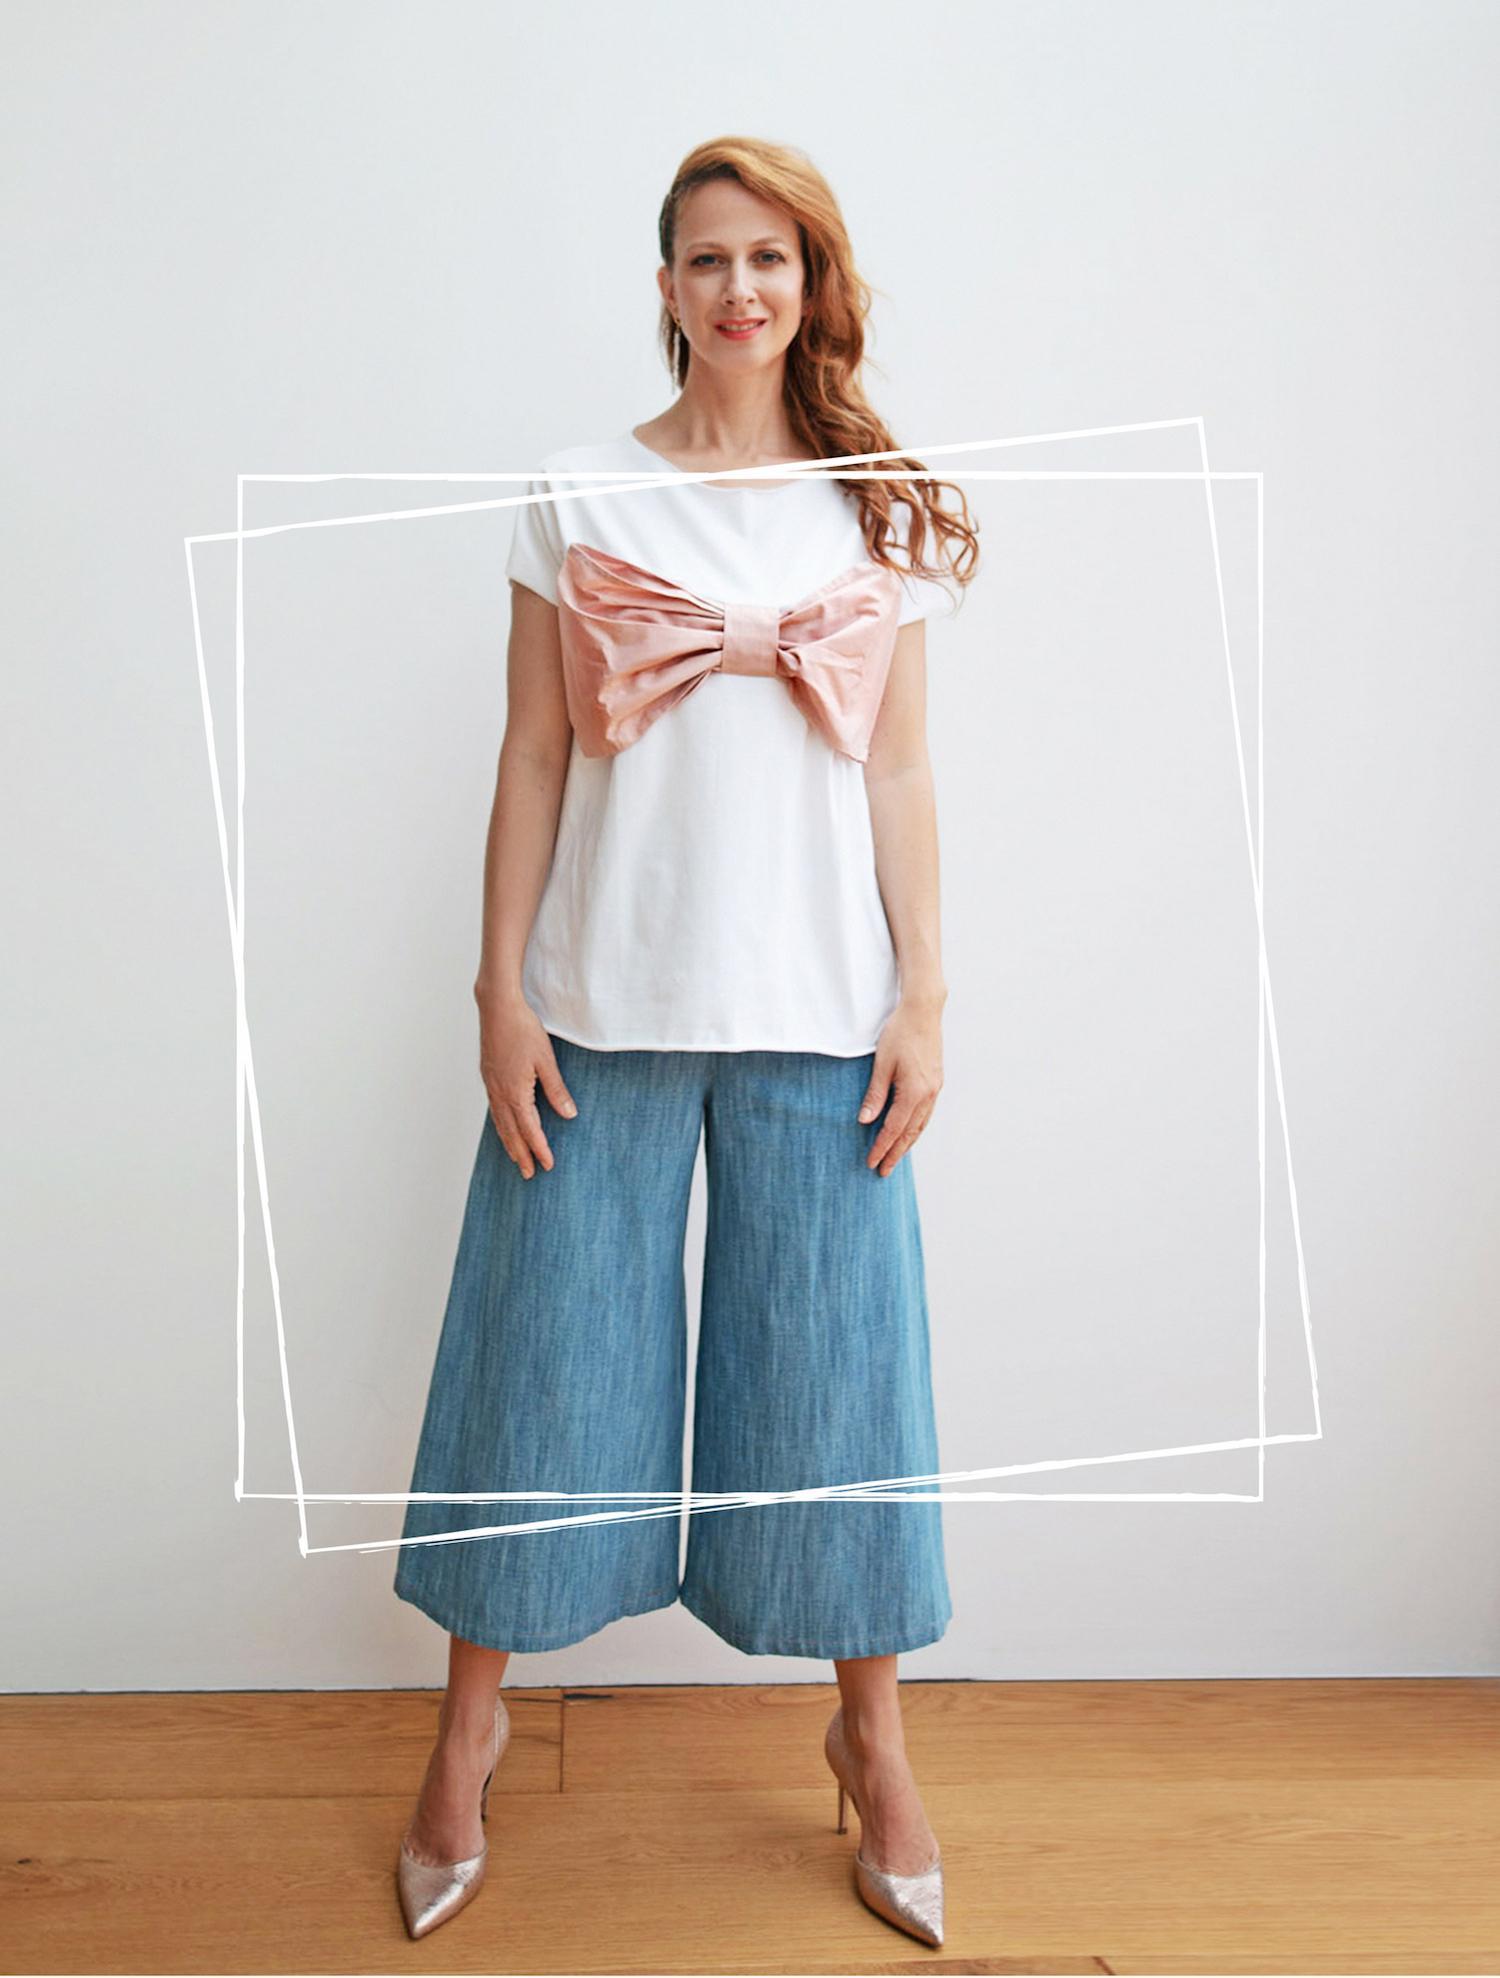 nika veger modni bloger sustainable trajnostno majica eko bombaz eva ahacevcic beautyfullblog